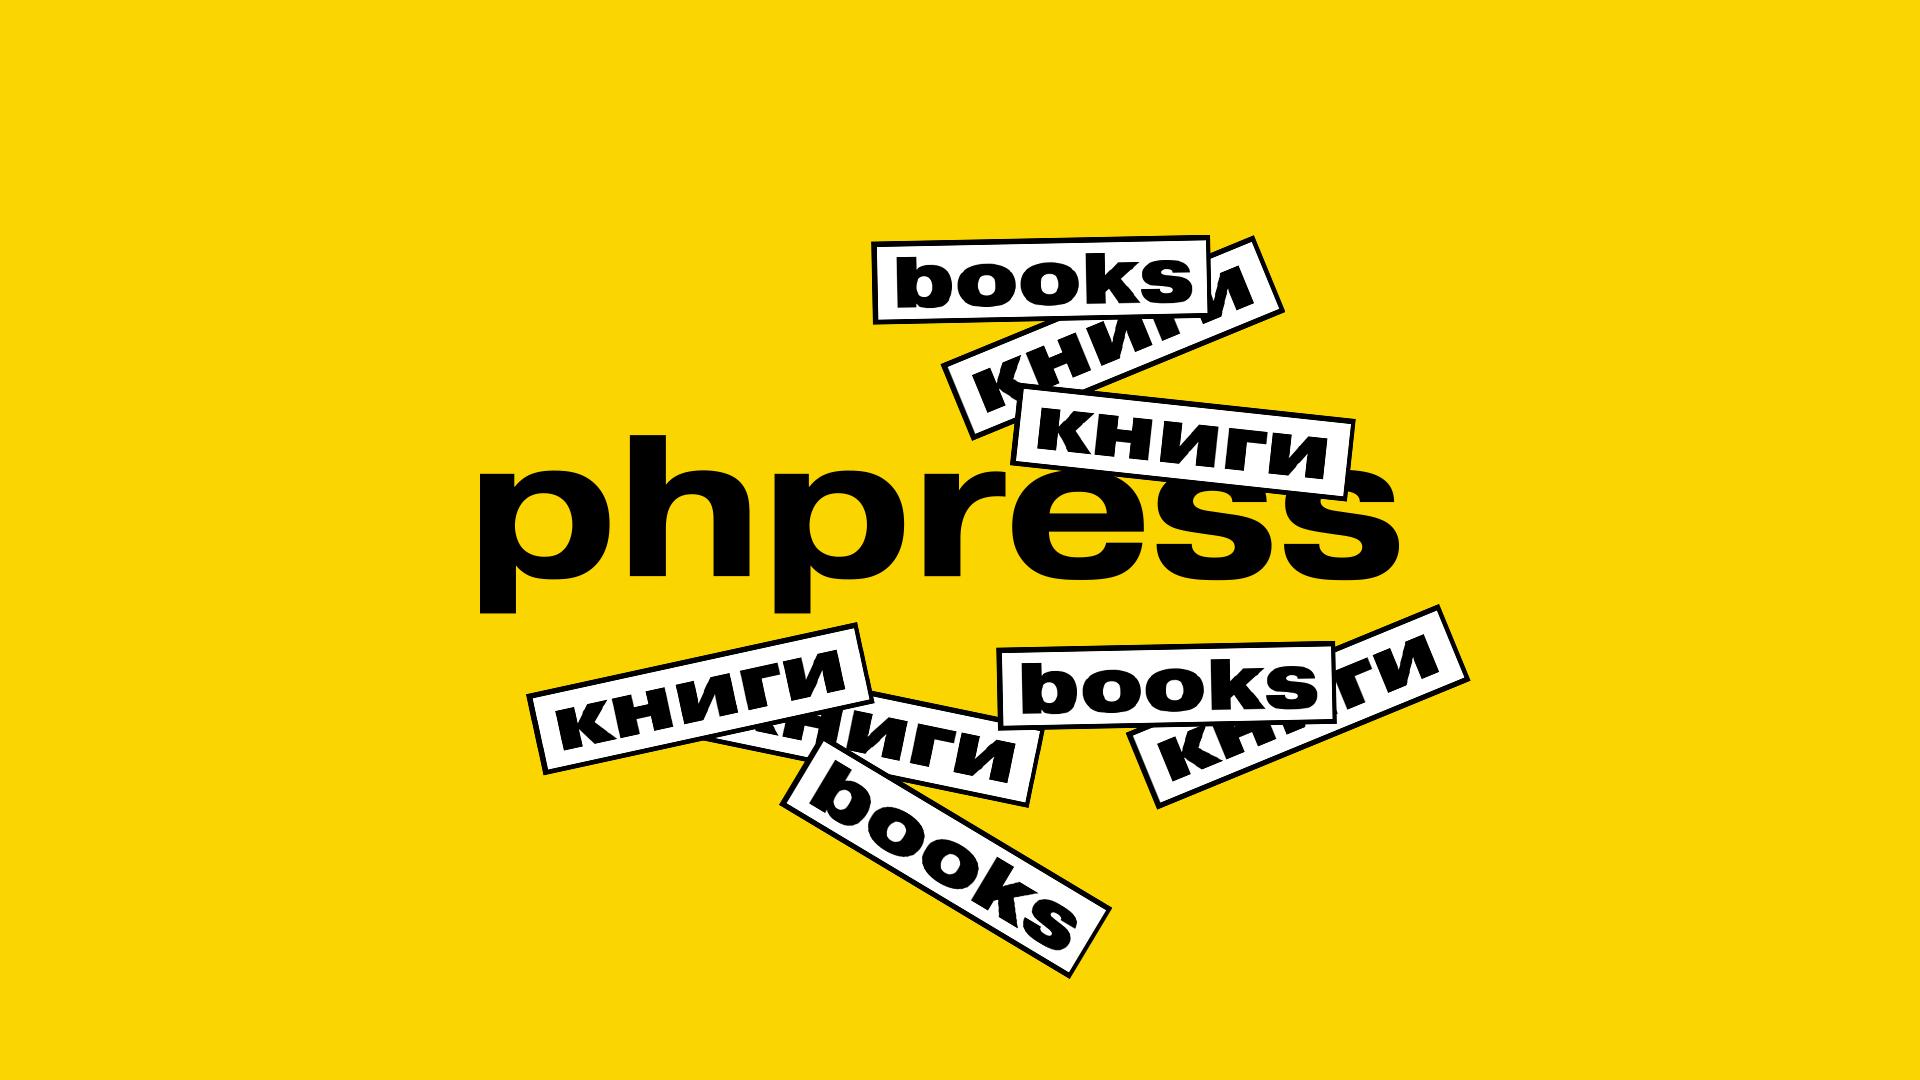 Страница рекламы печати книг типографии phpress